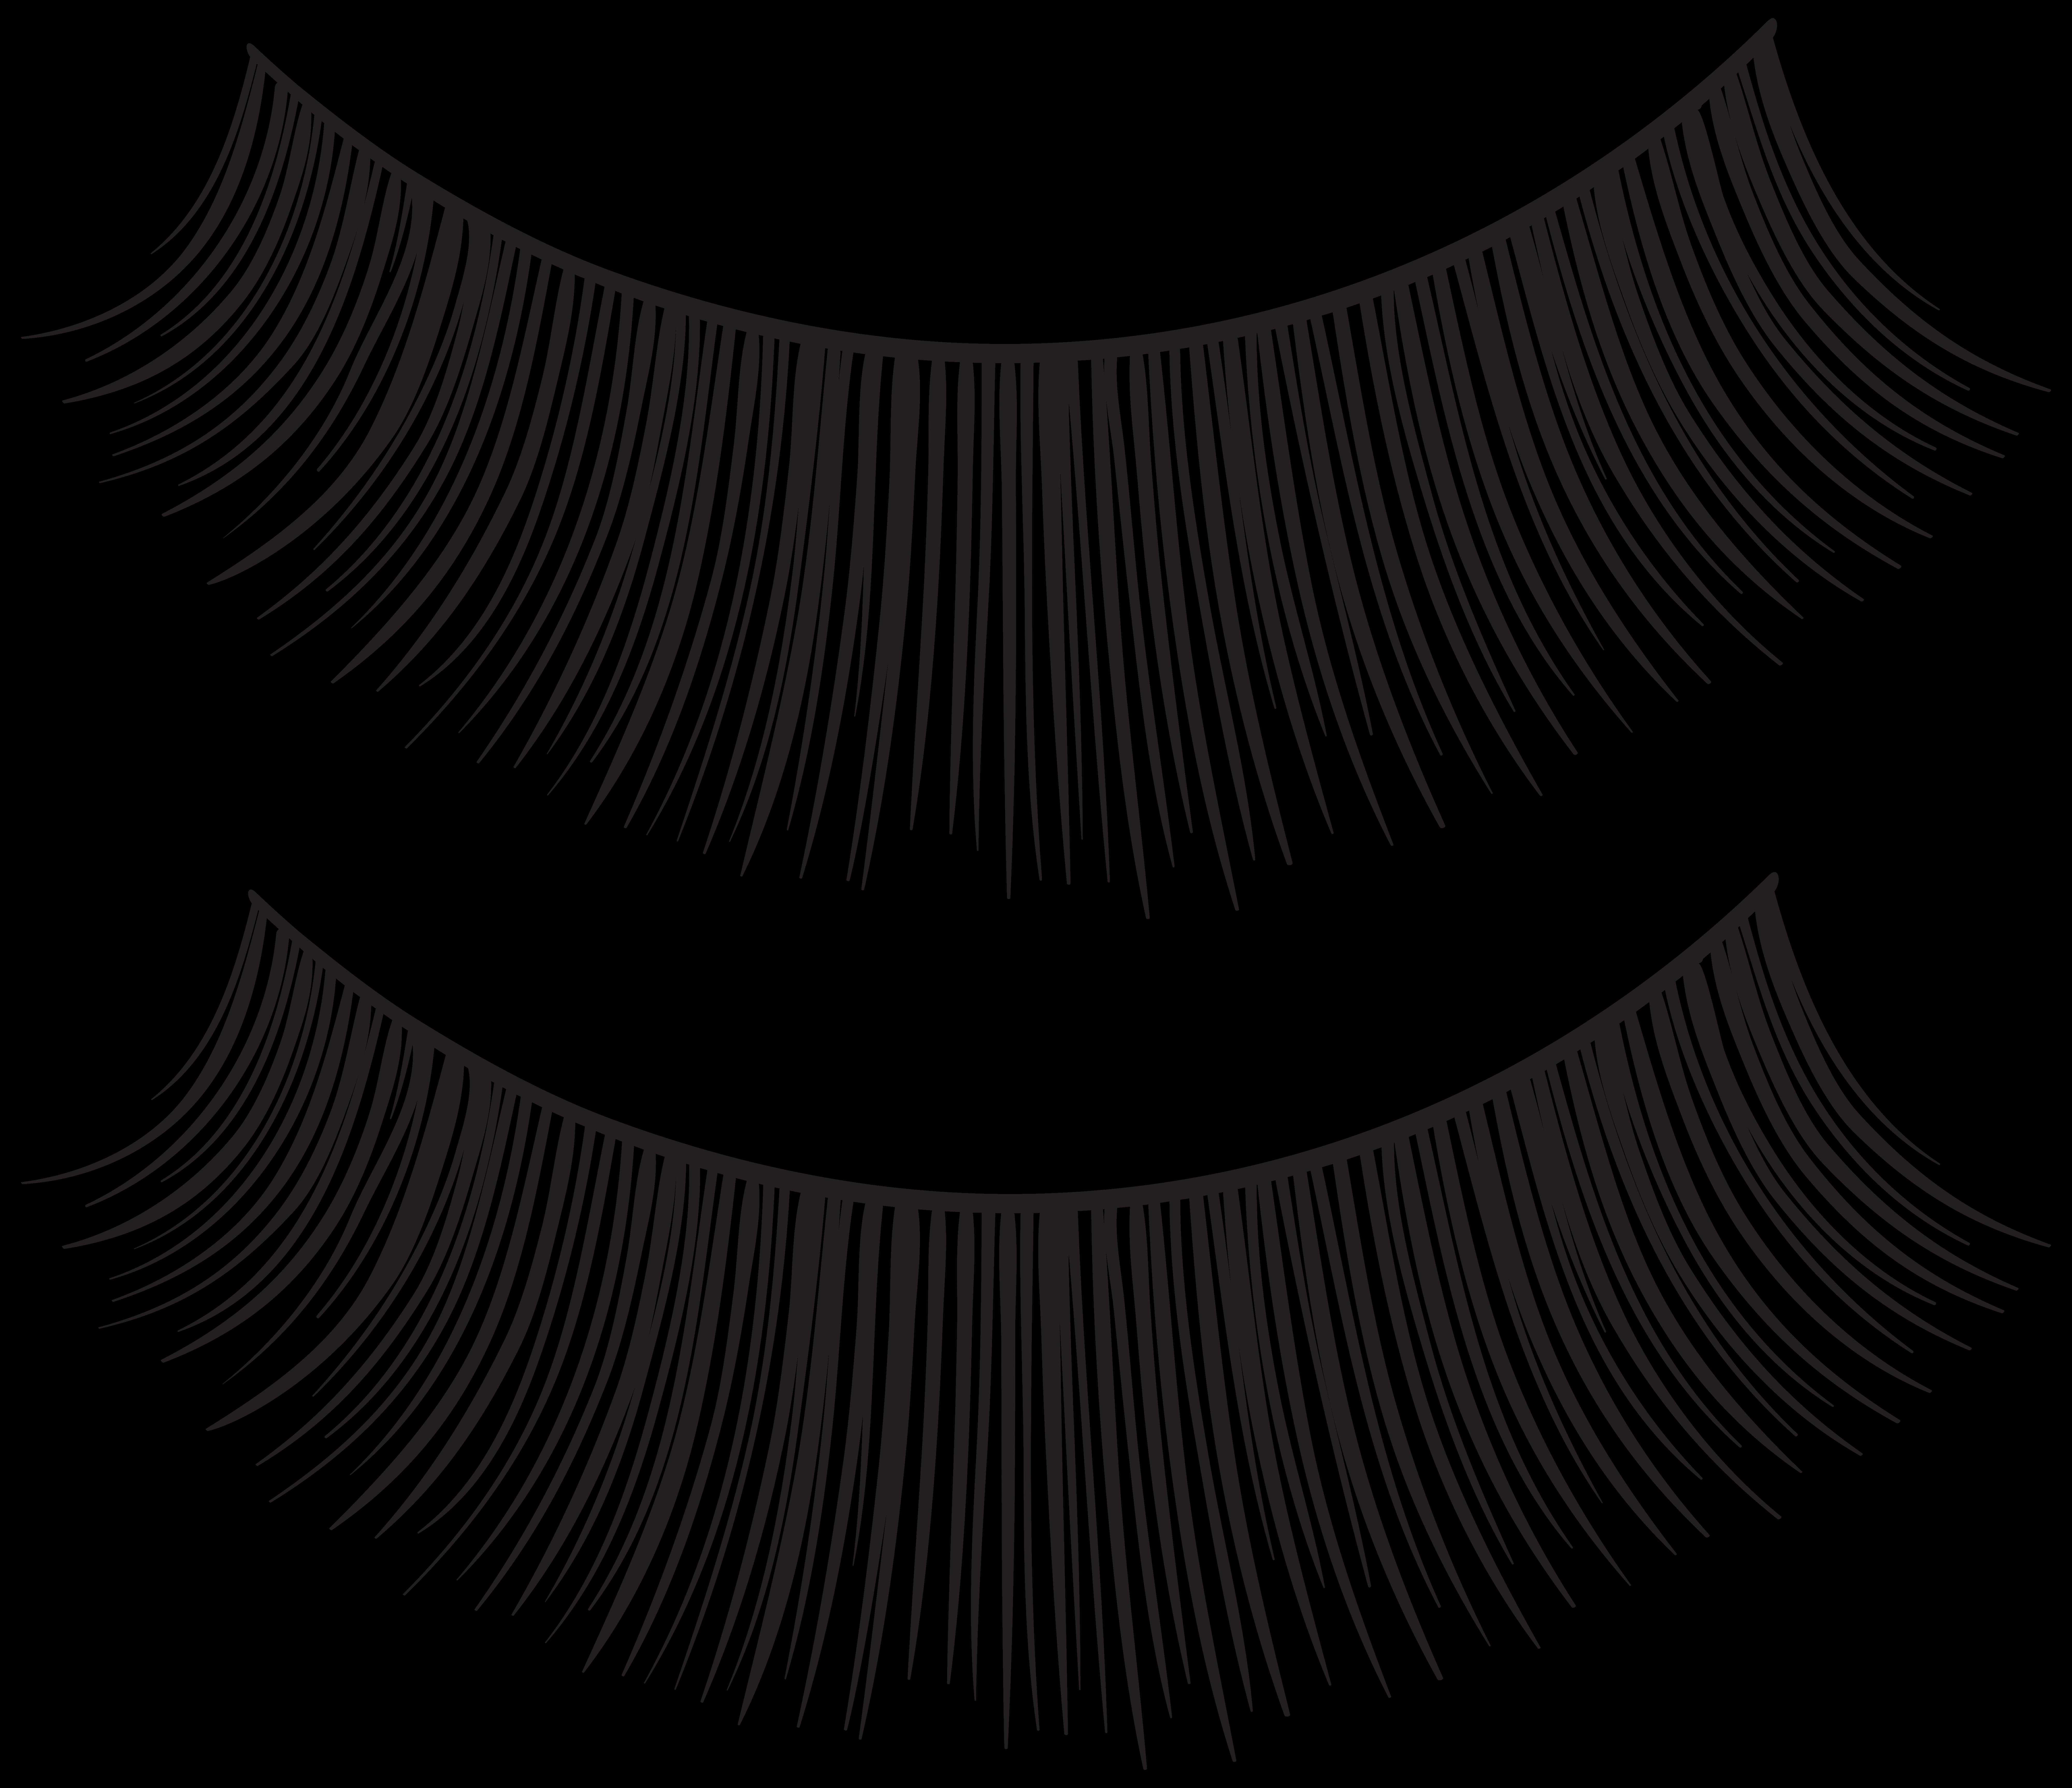 Eyelashes clipart natural.  collection of no